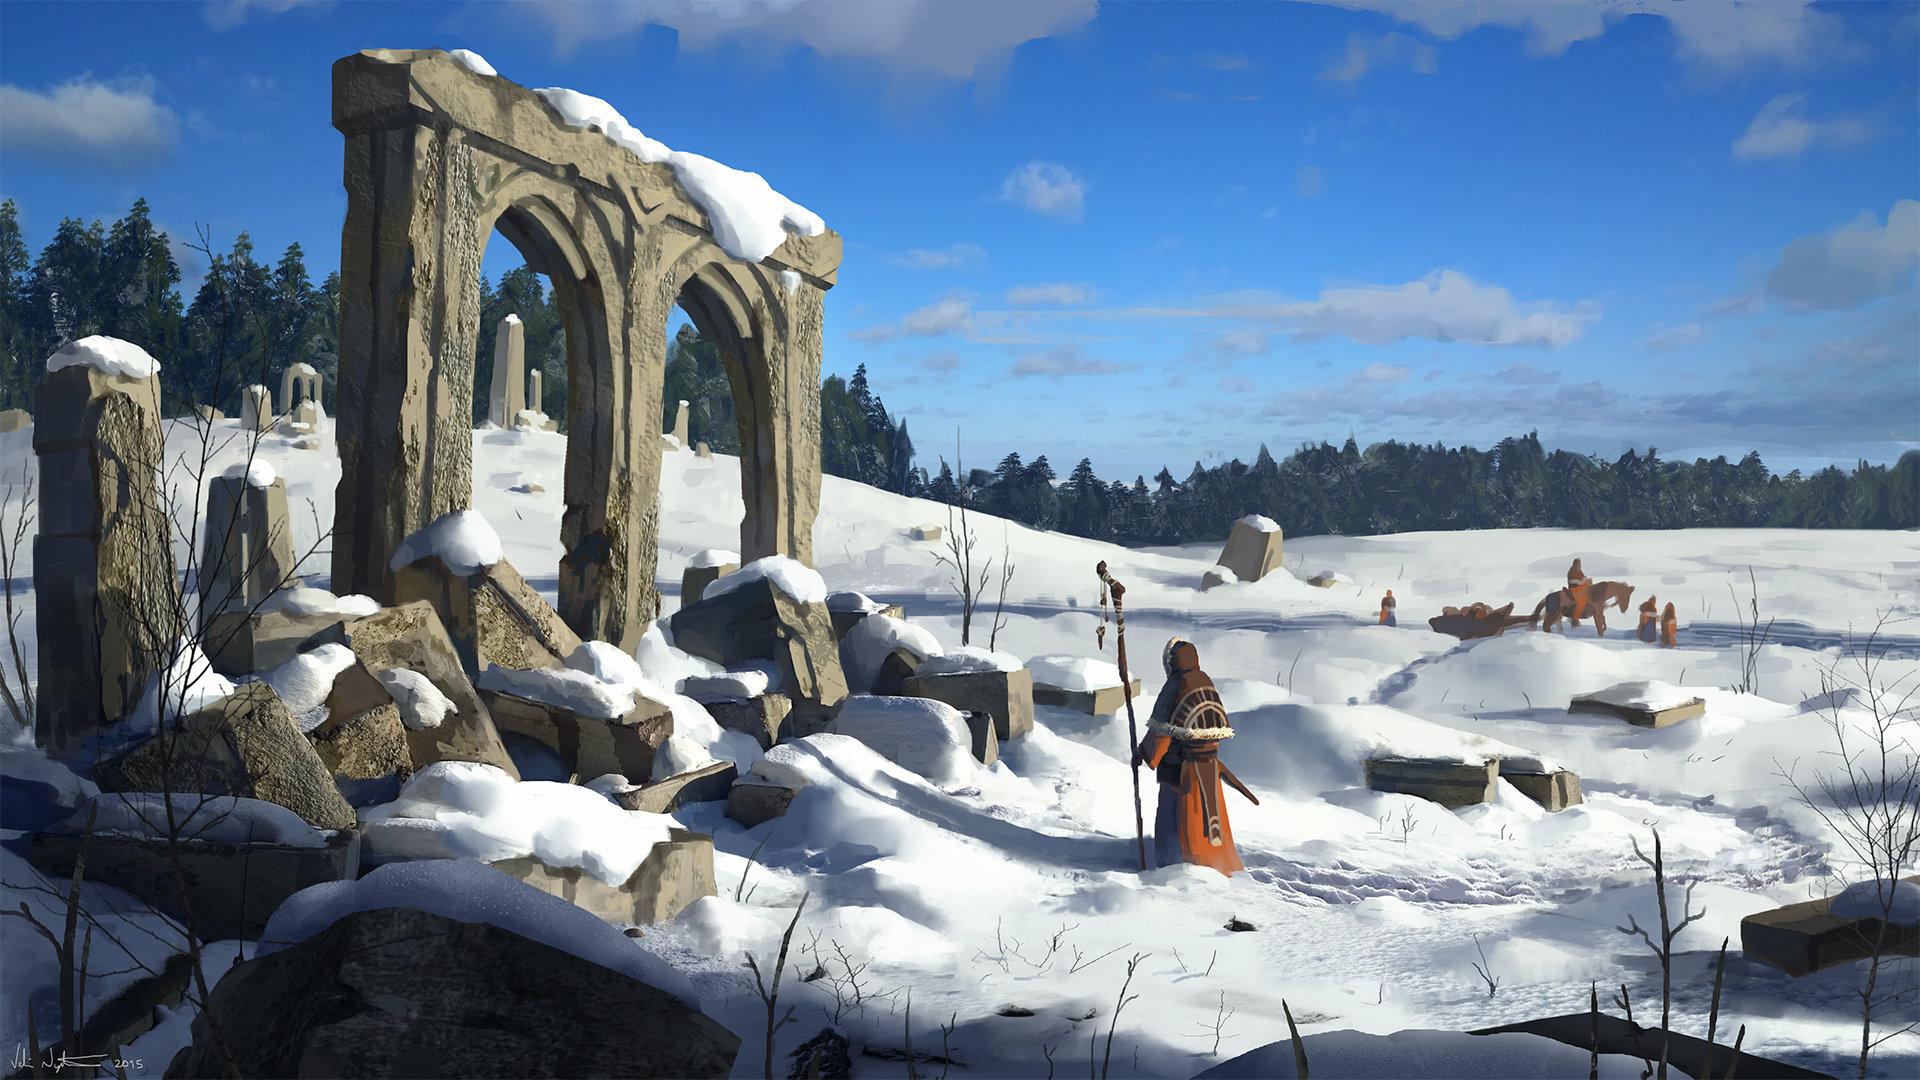 Veli nystrom snowy ruins